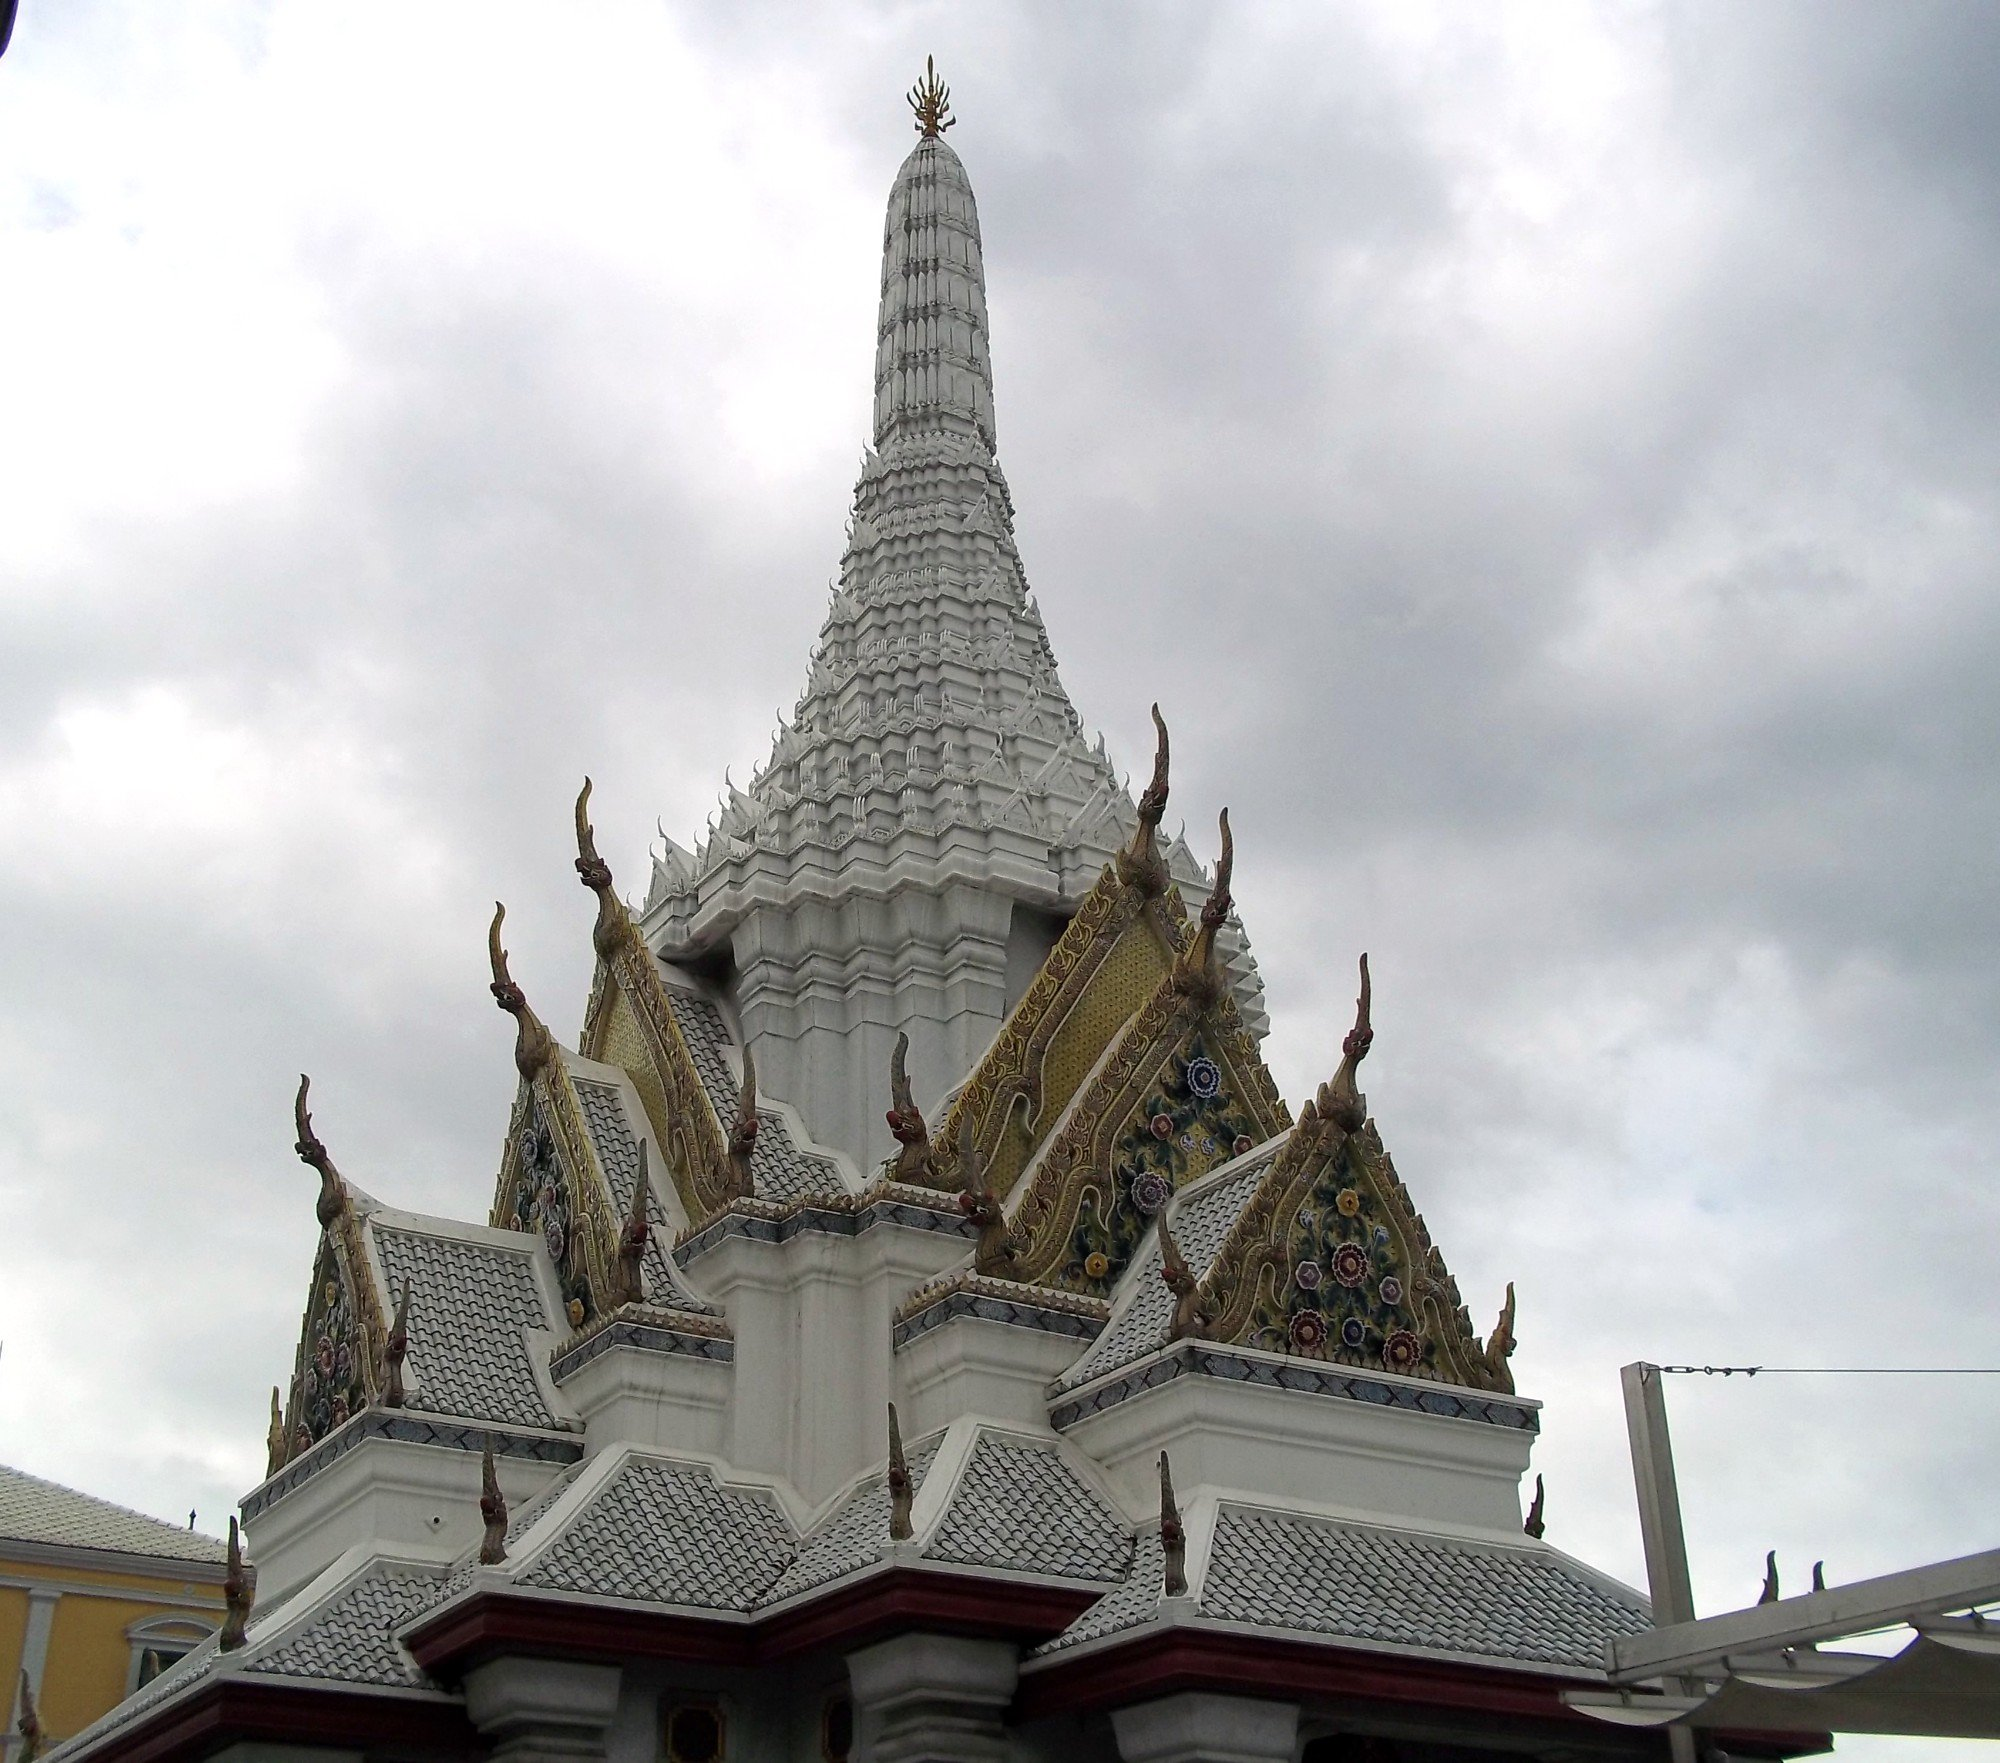 Roof of the Bangkok City Pillar Shrine